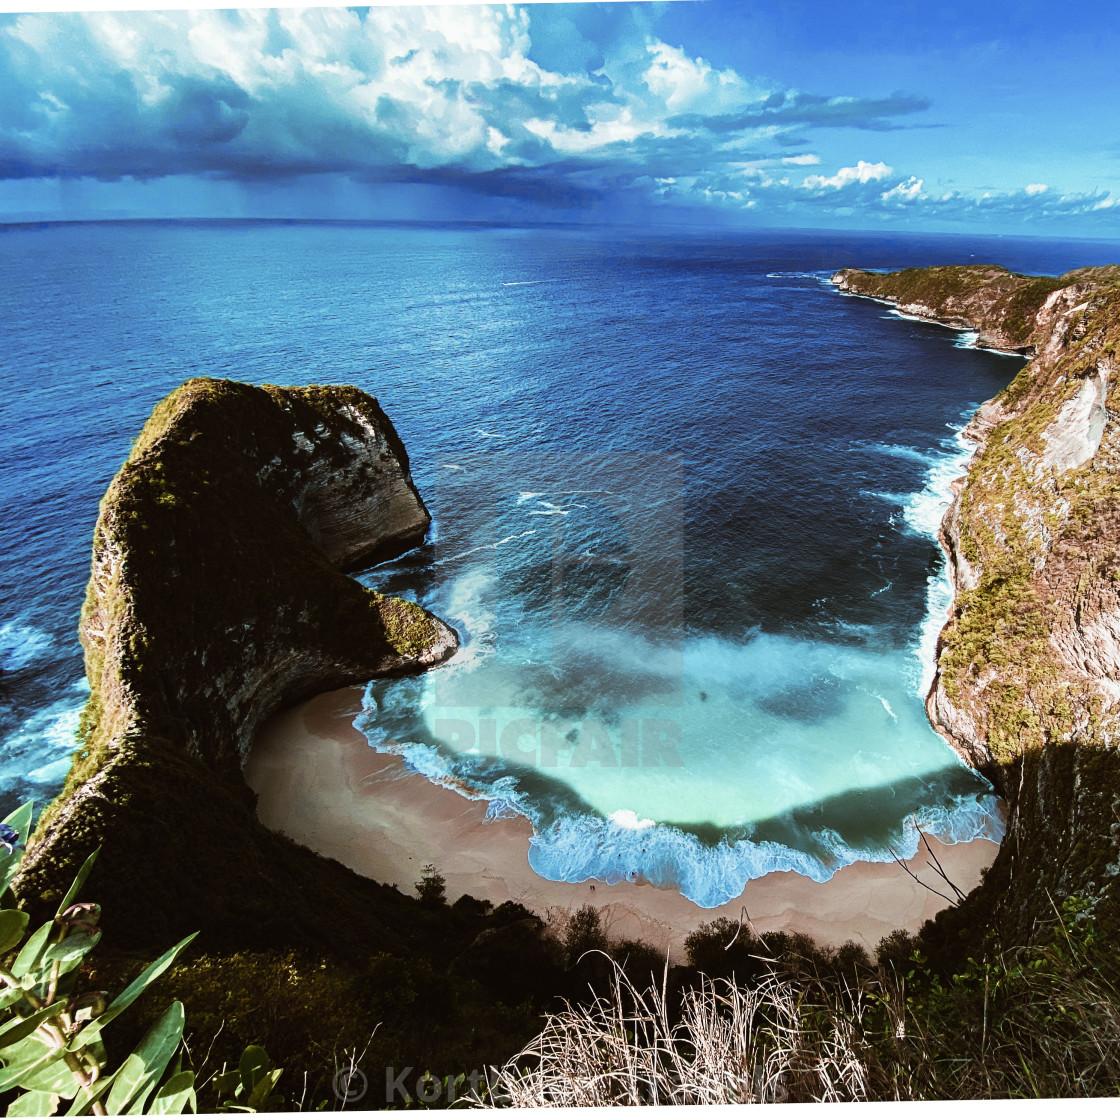 """Full aerial view of Kelingking Beach, Nusa Penida Island, Indonesia"" stock image"